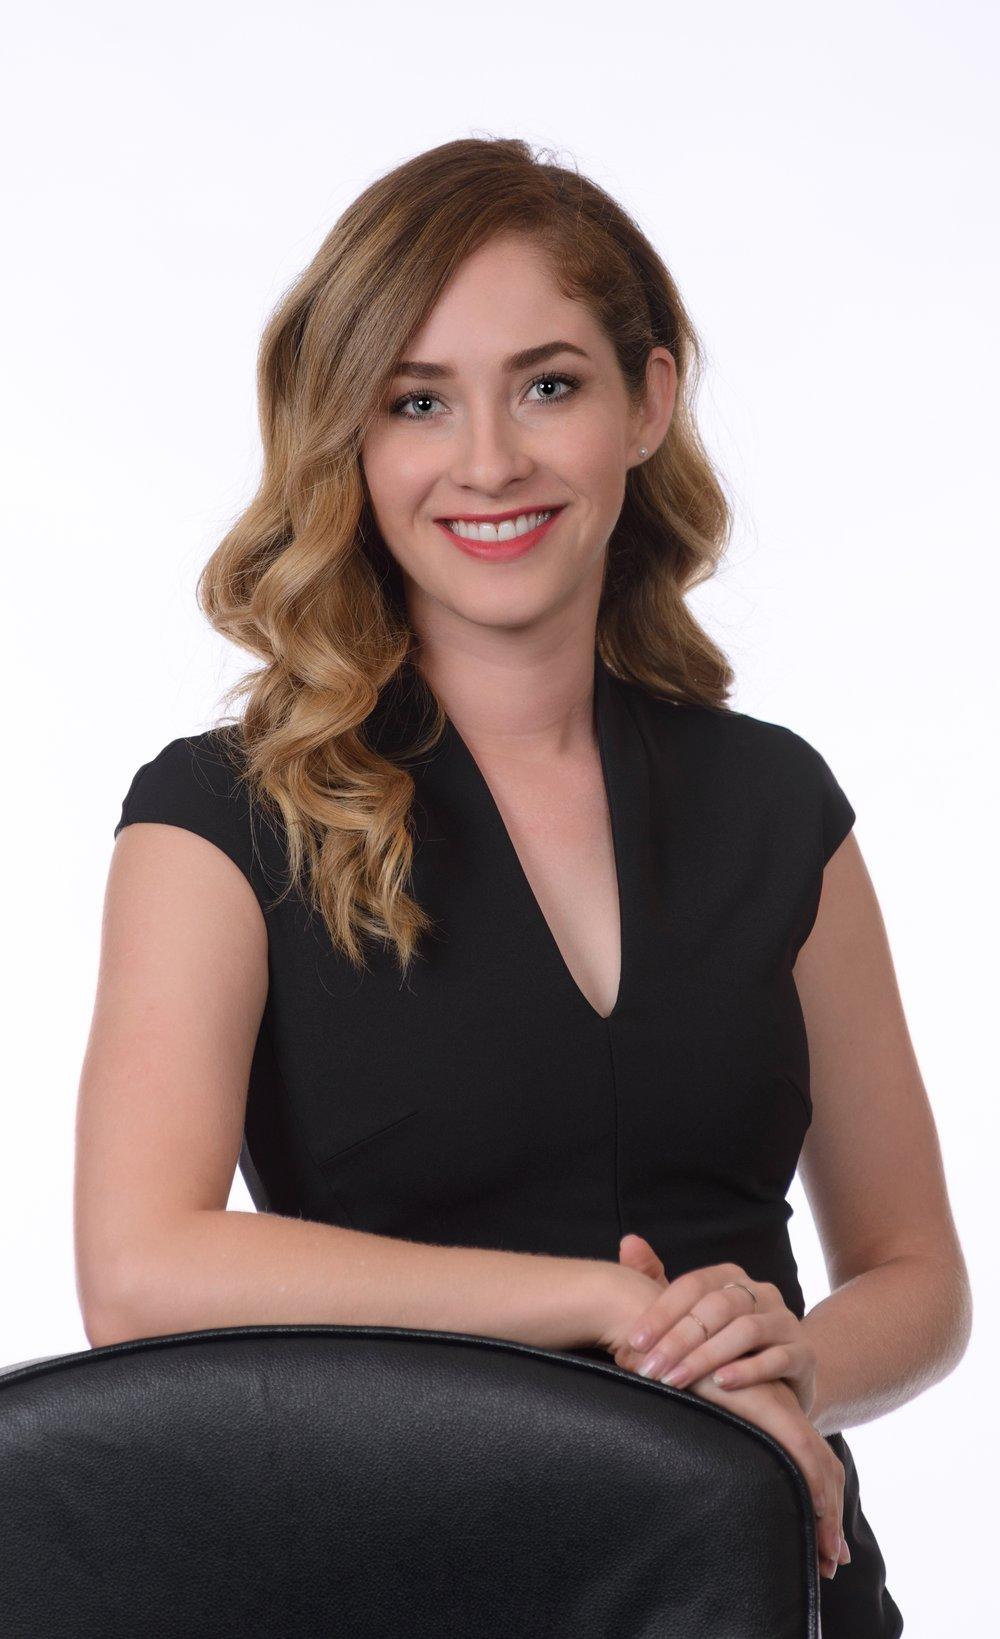 Ana Lucia Garro, fundador de Po wer House